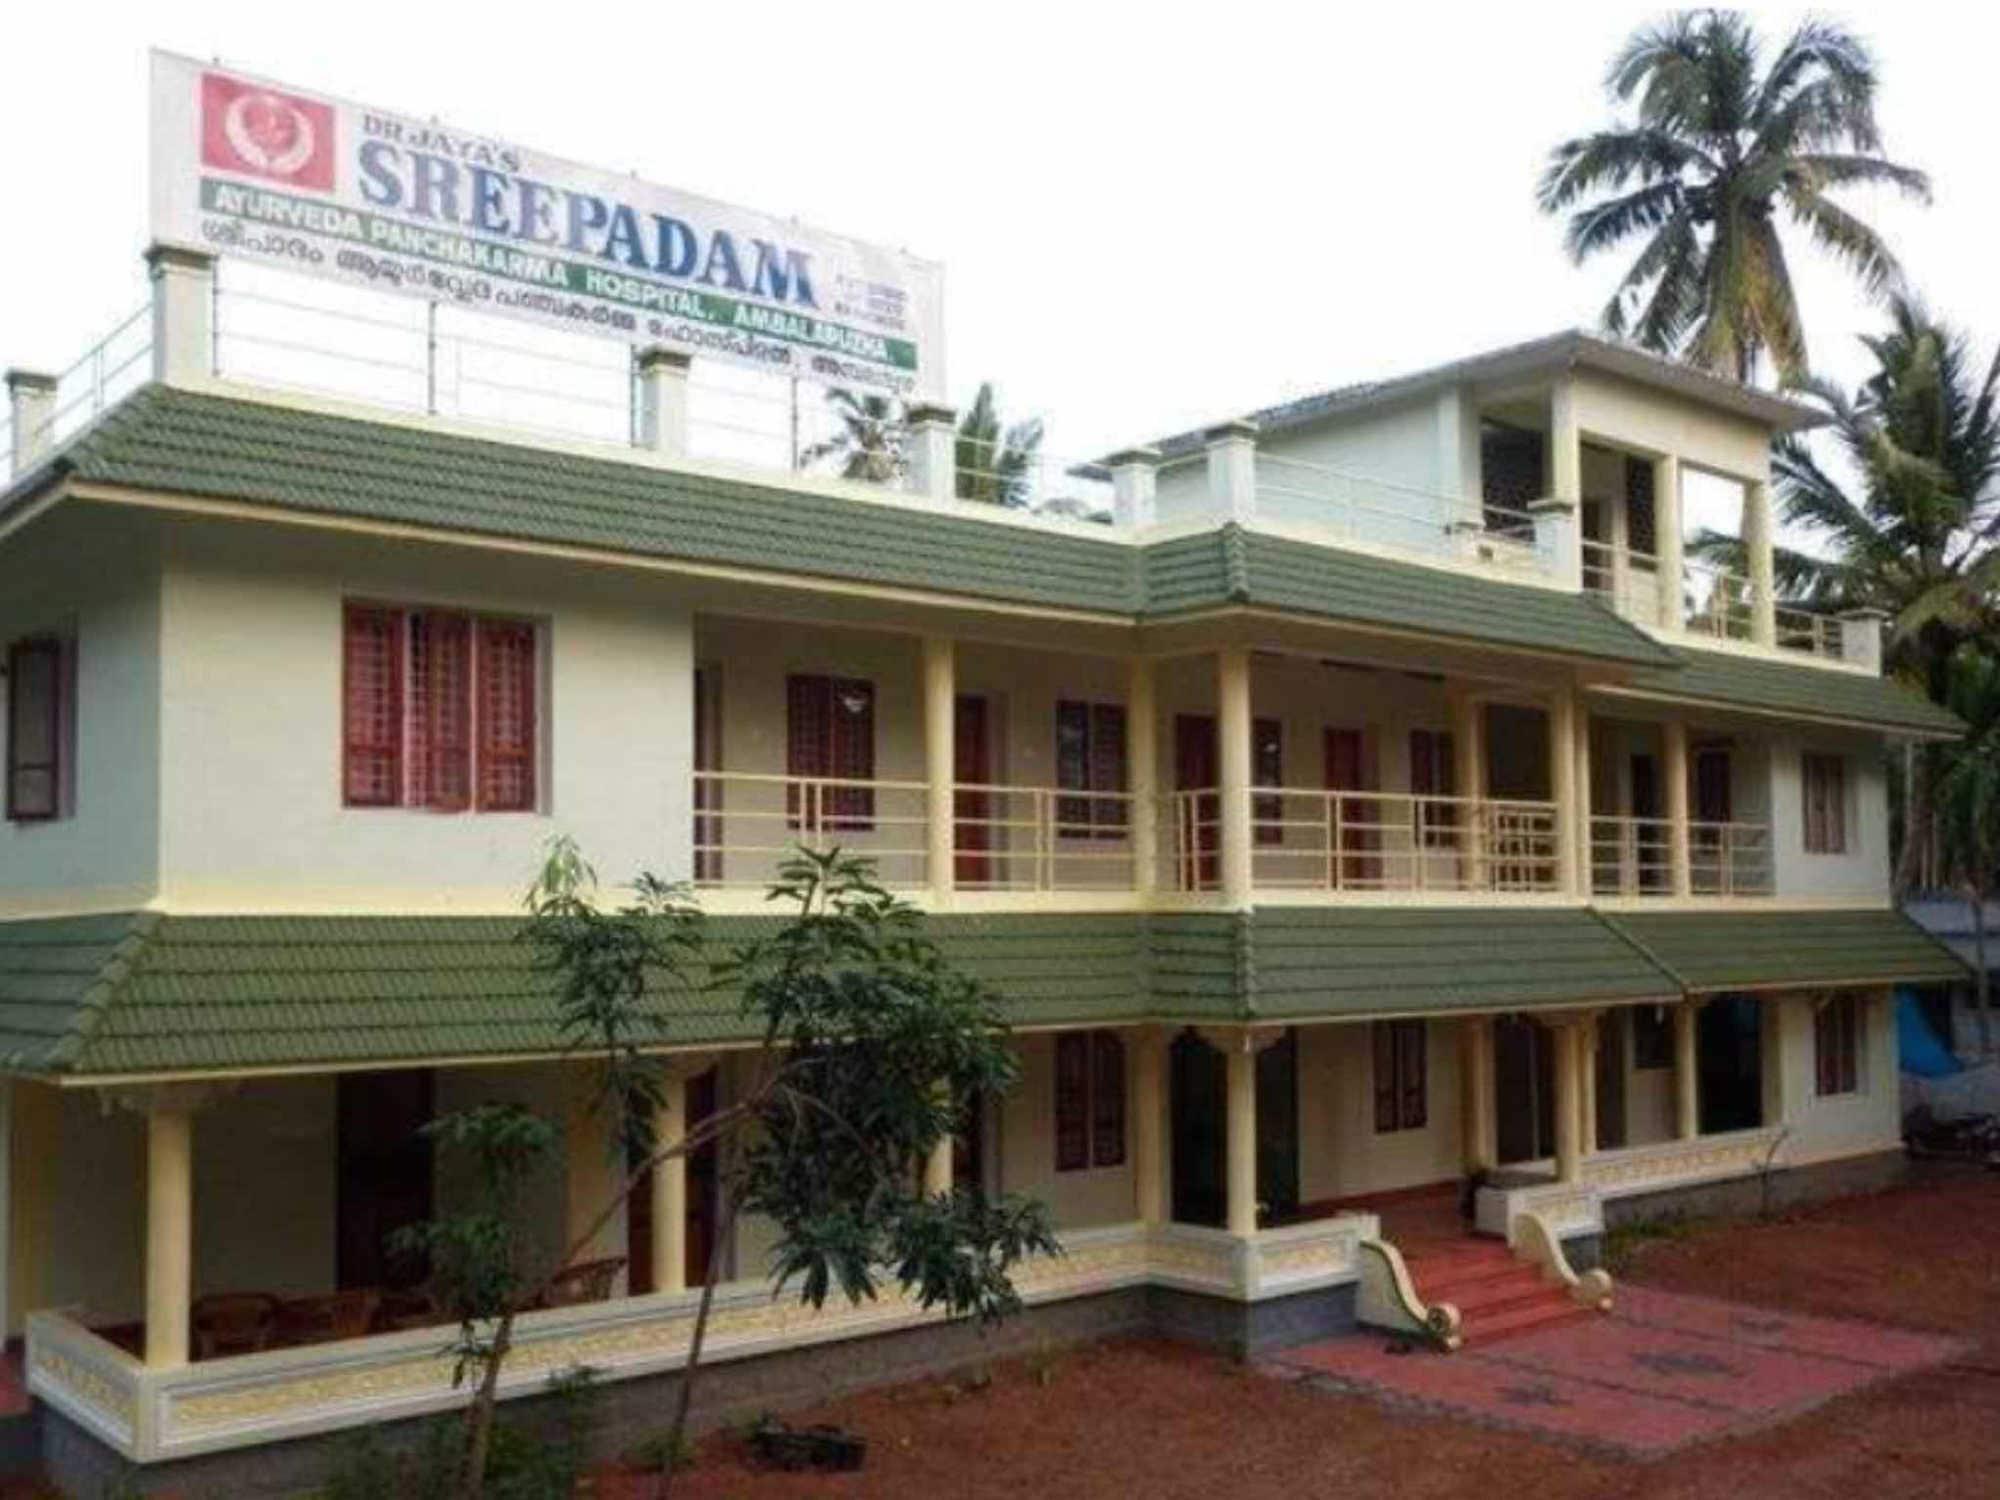 Dr. Jayas Sreepadam Ayurveda Panchakarma Hospital, PANCHAKARMA TREATMENT,  service in Ambalappuzha, Alappuzha